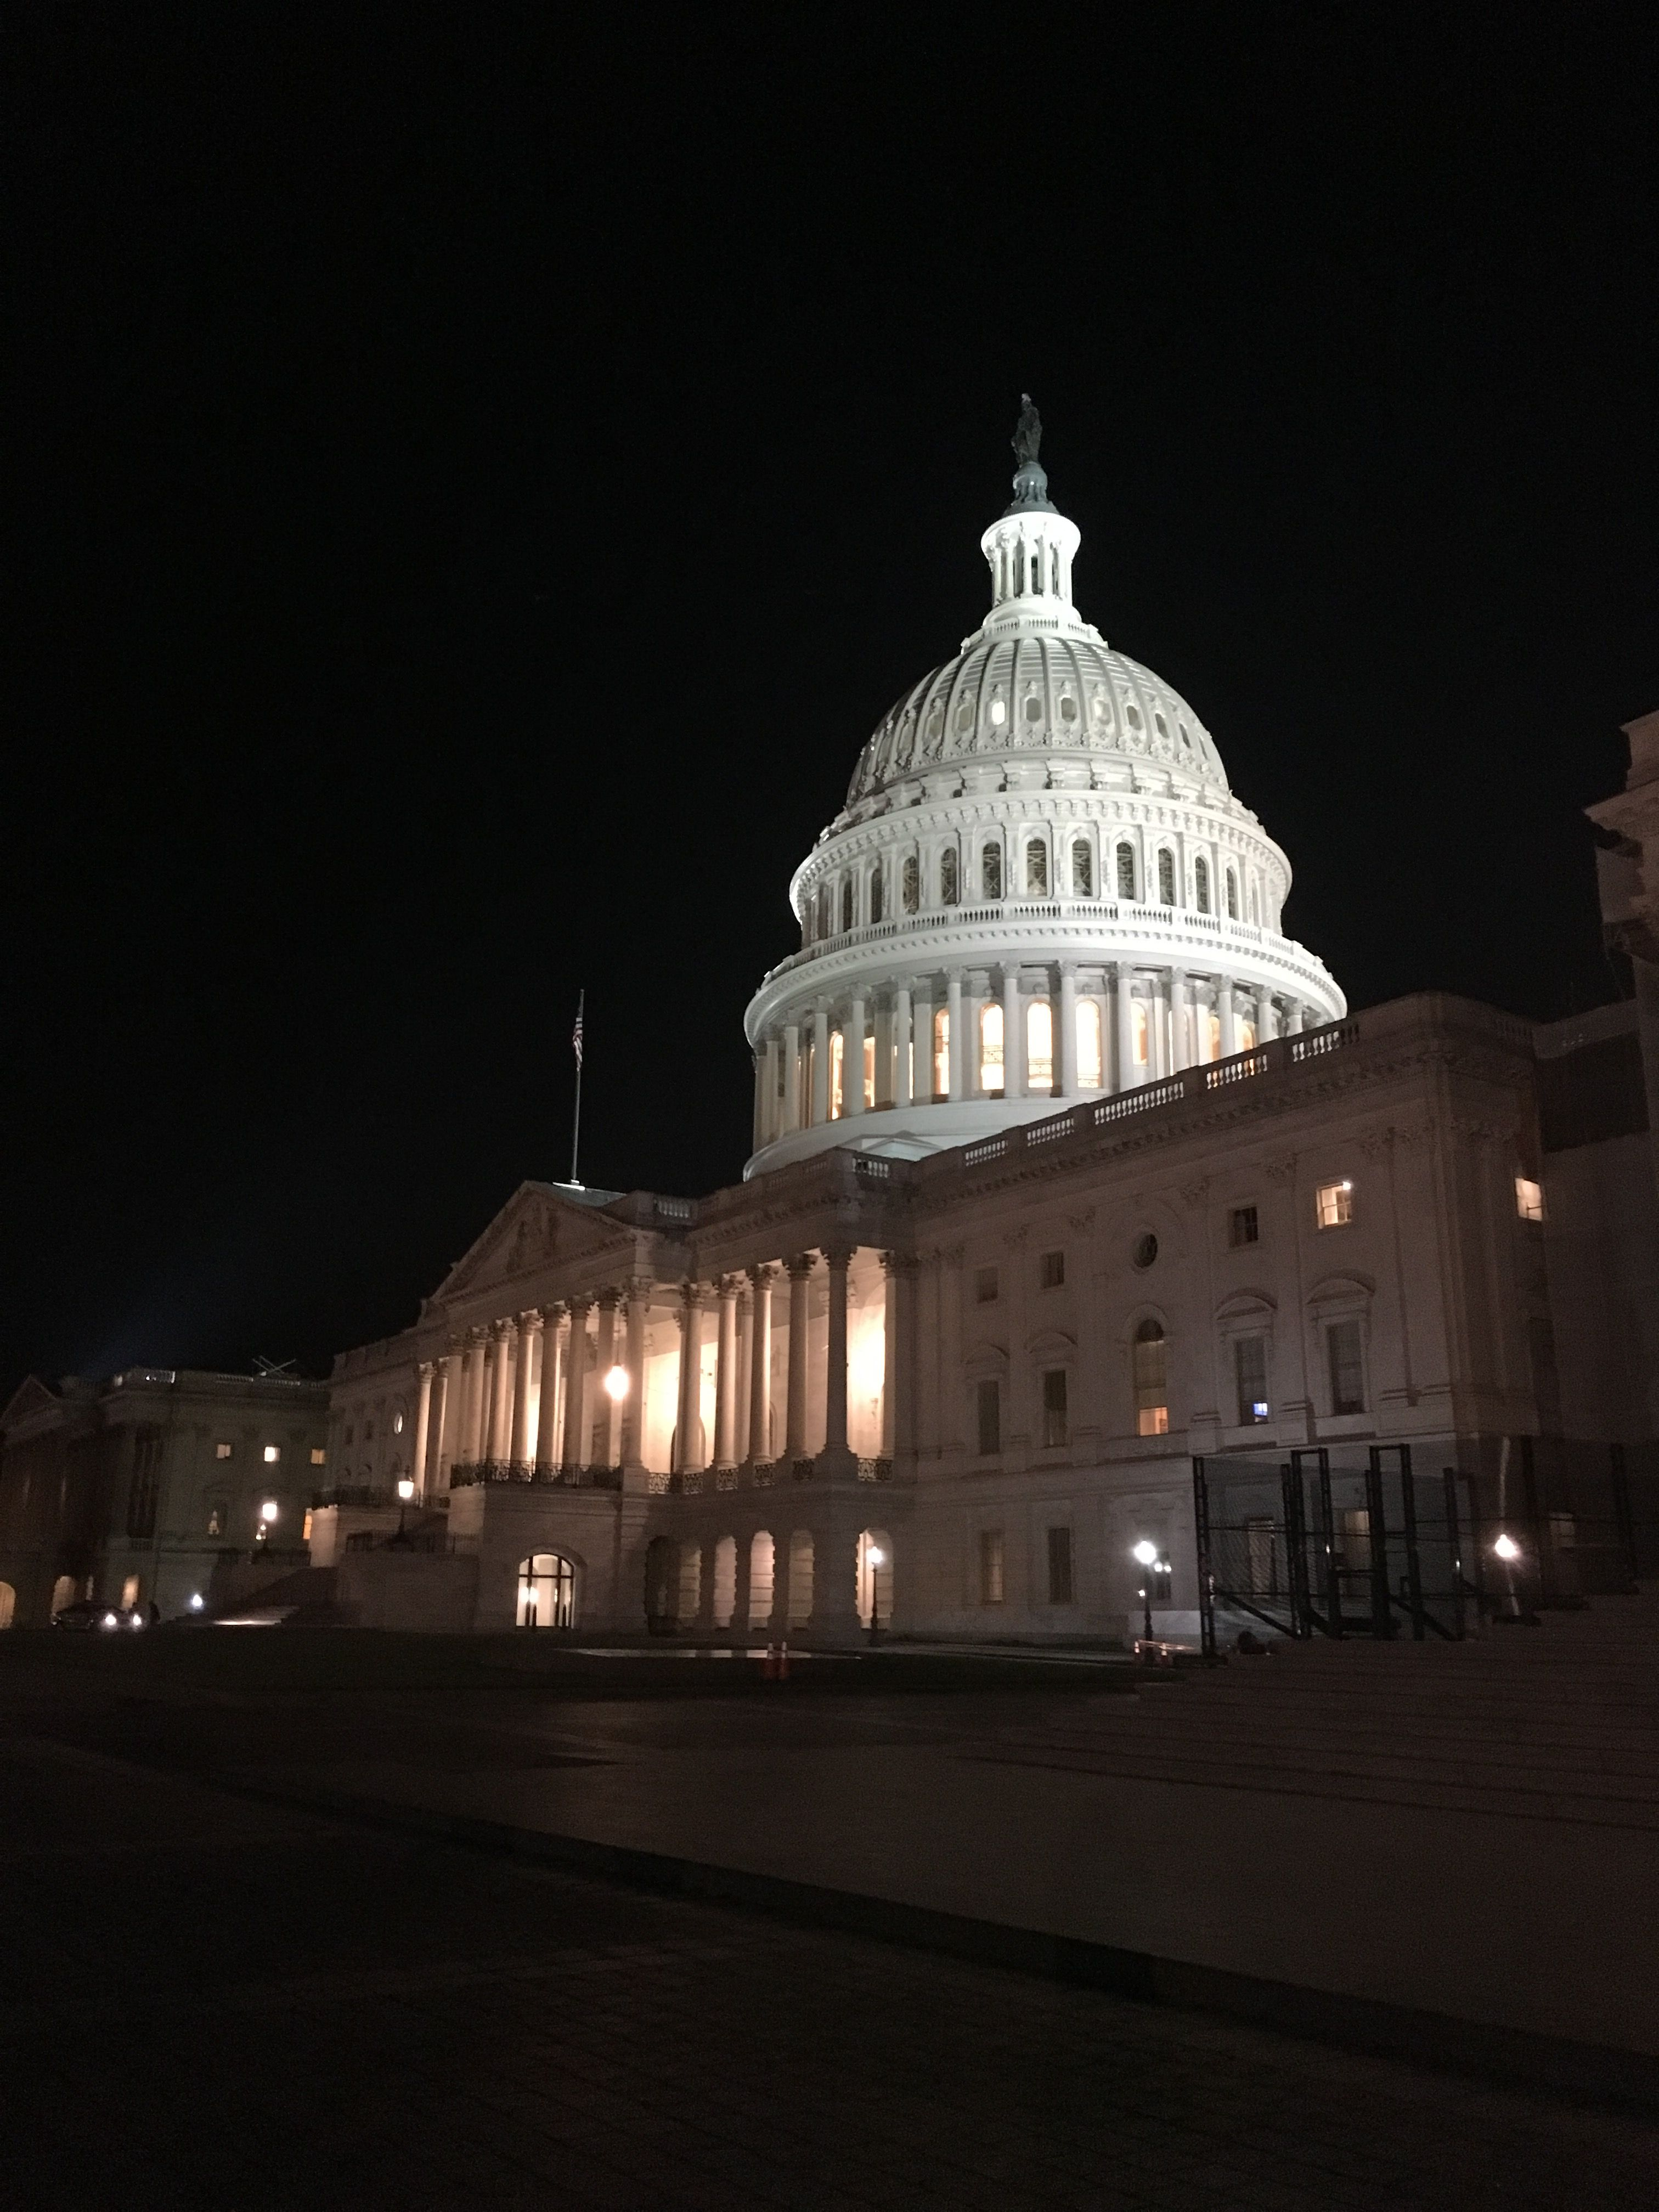 Washington D C Is Even More Beautiful At Night Taj Mahal